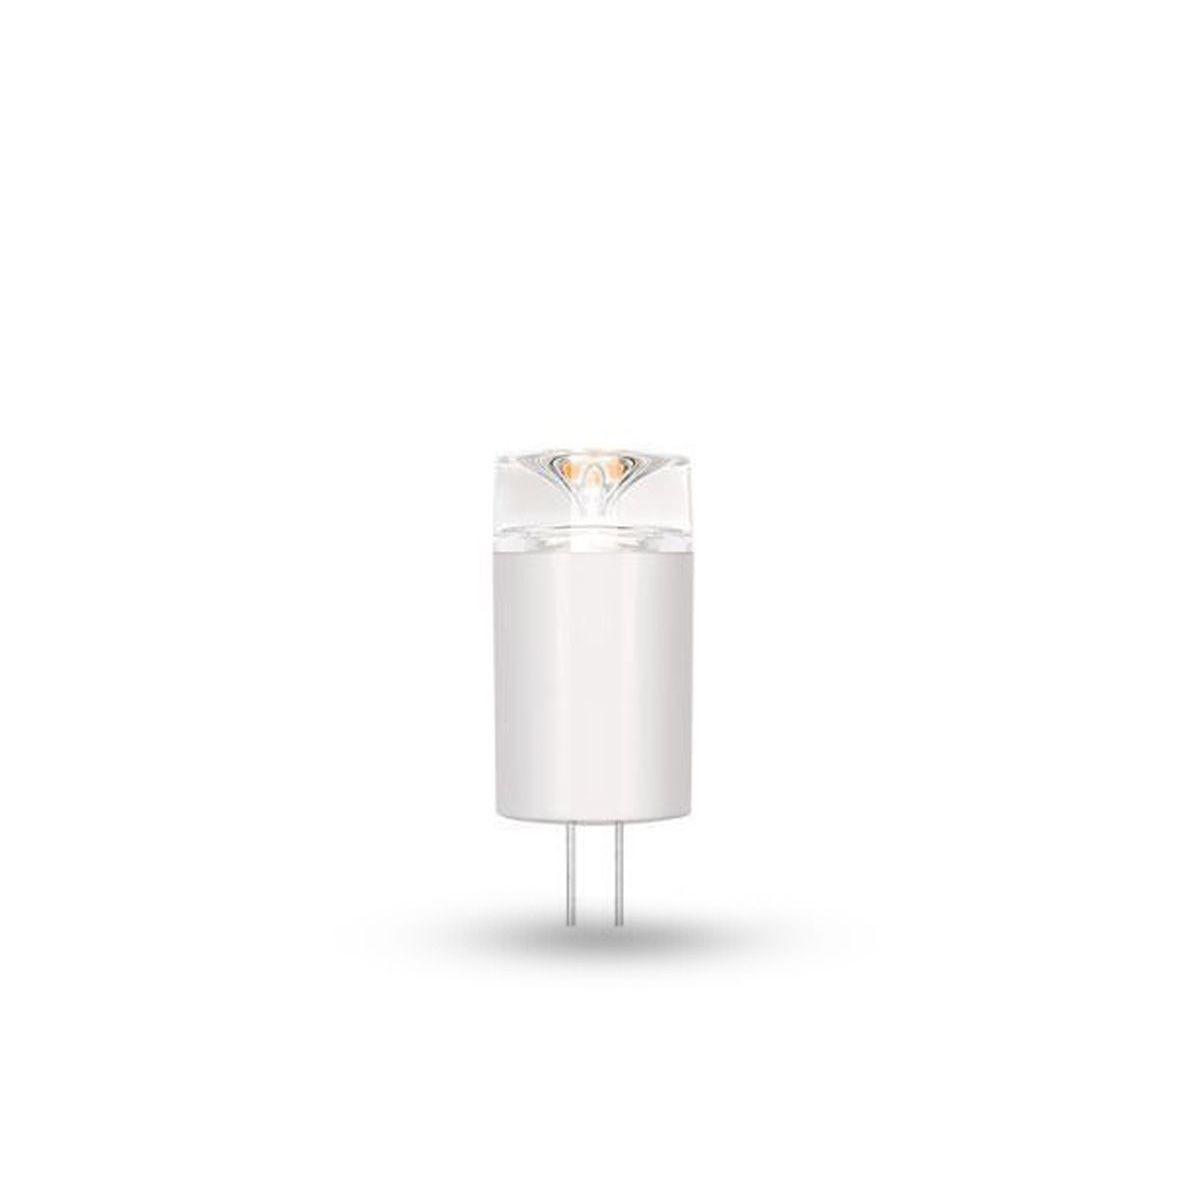 Lâmpada LED Bi-Pino G4 2W 2700K -12V - Stella - STH6103/27